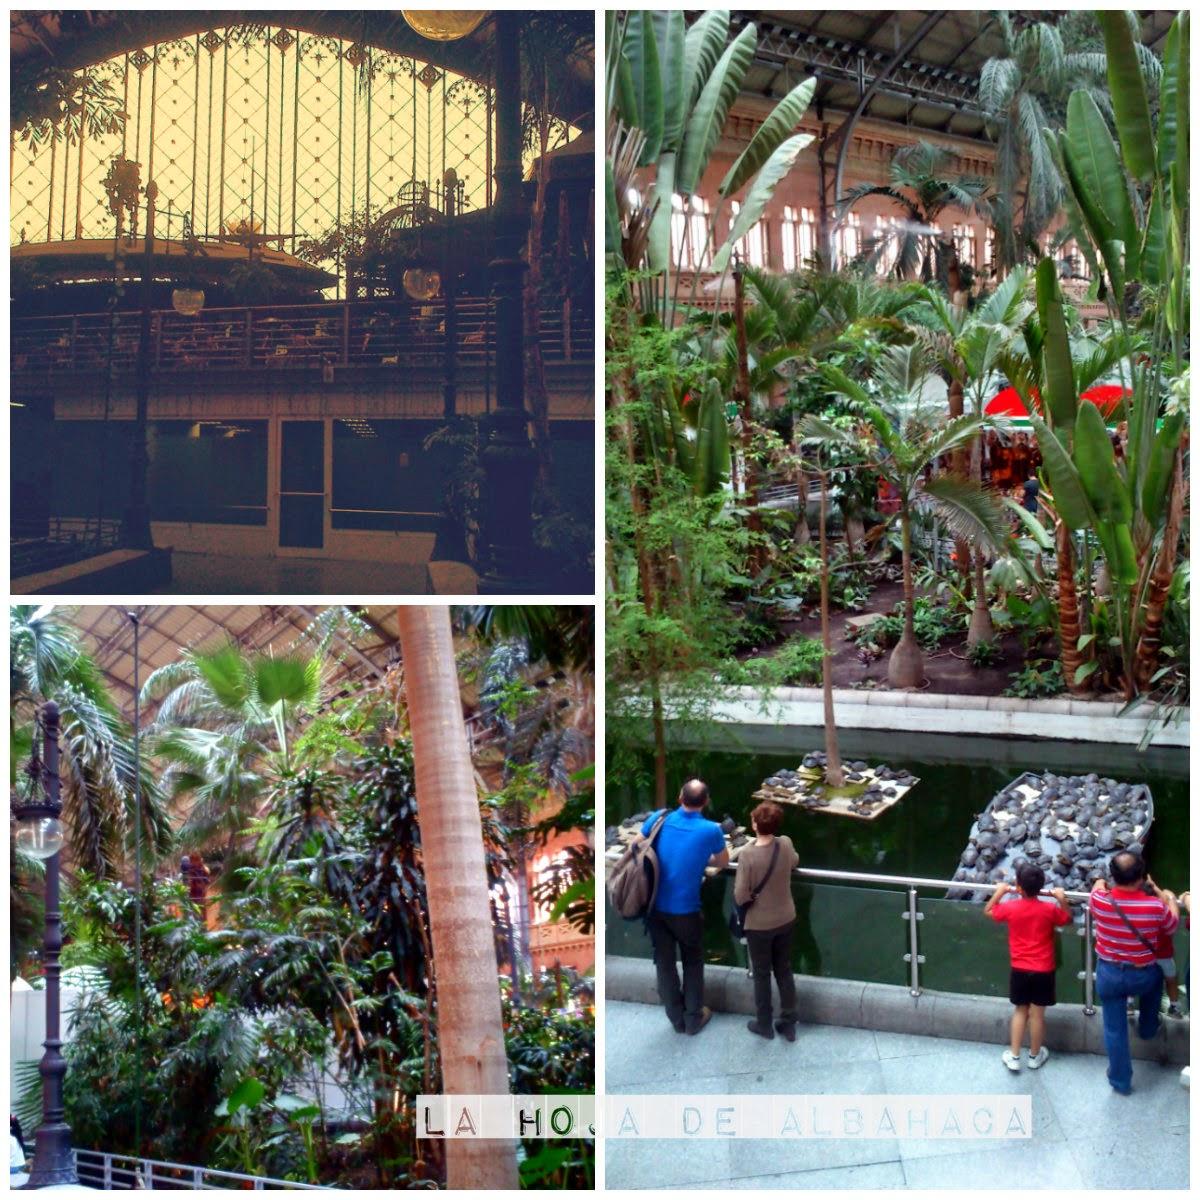 jardín tropical, invernadero,Madrid, Atocha, viajes, trenes